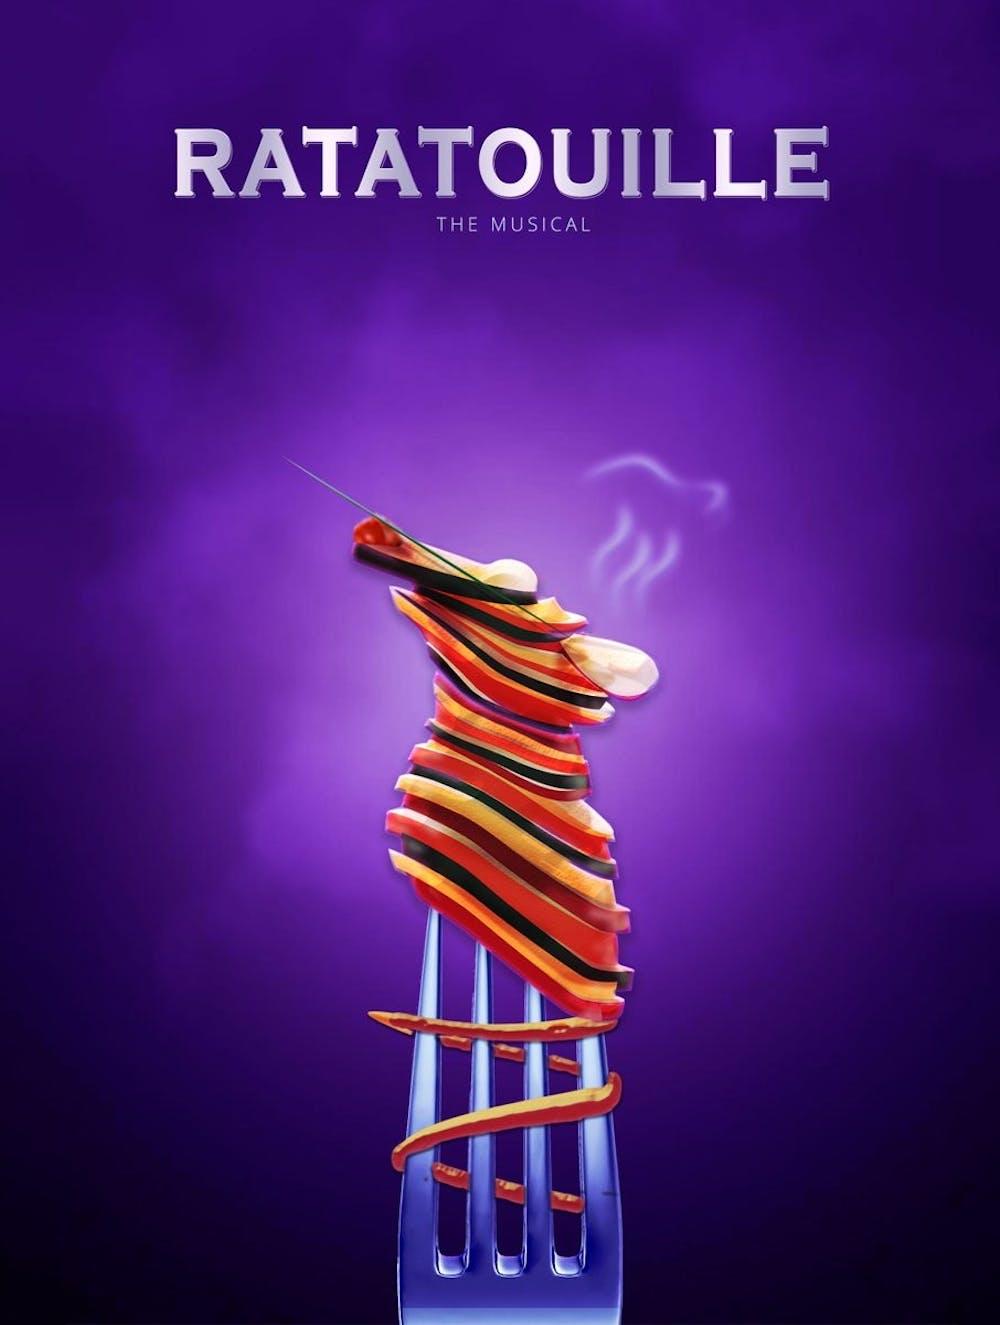 So Listen: Let's talk about 'Ratatouille: The Musical'